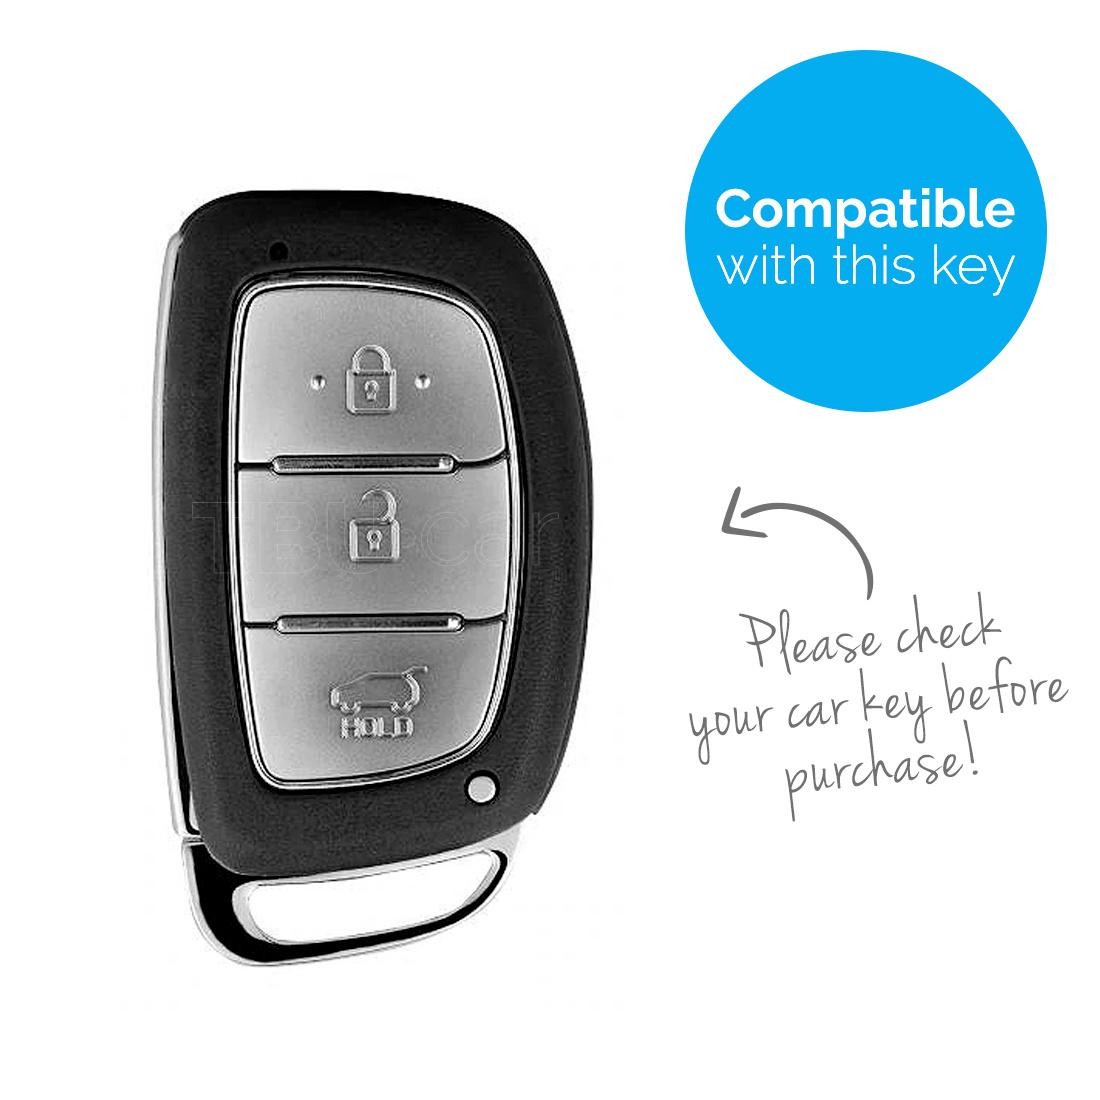 TBU car TBU car Sleutel cover compatibel met Hyundai - Silicone sleutelhoesje - beschermhoesje autosleutel - Lime groen